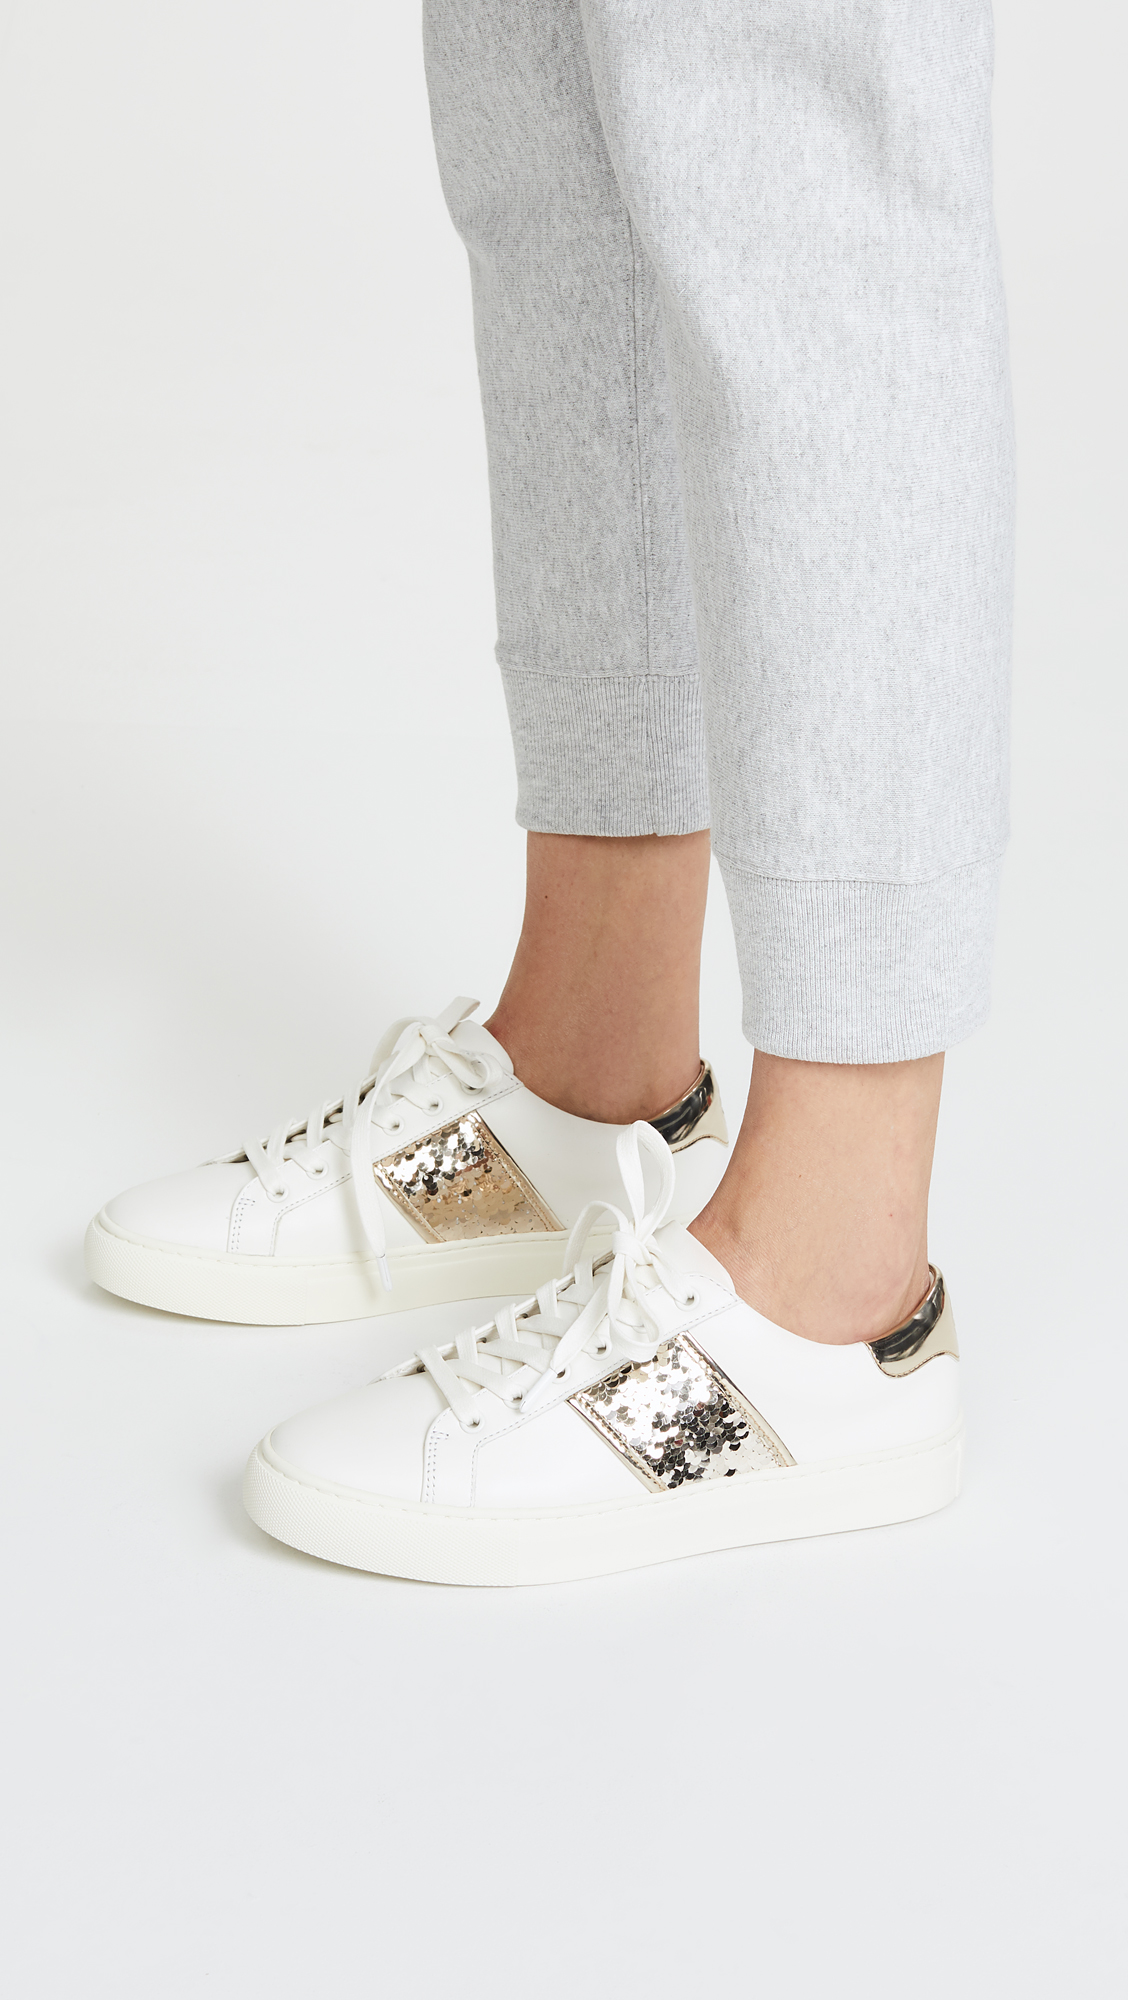 2de609f55db Tory Burch Carter Lace Up Sneakers